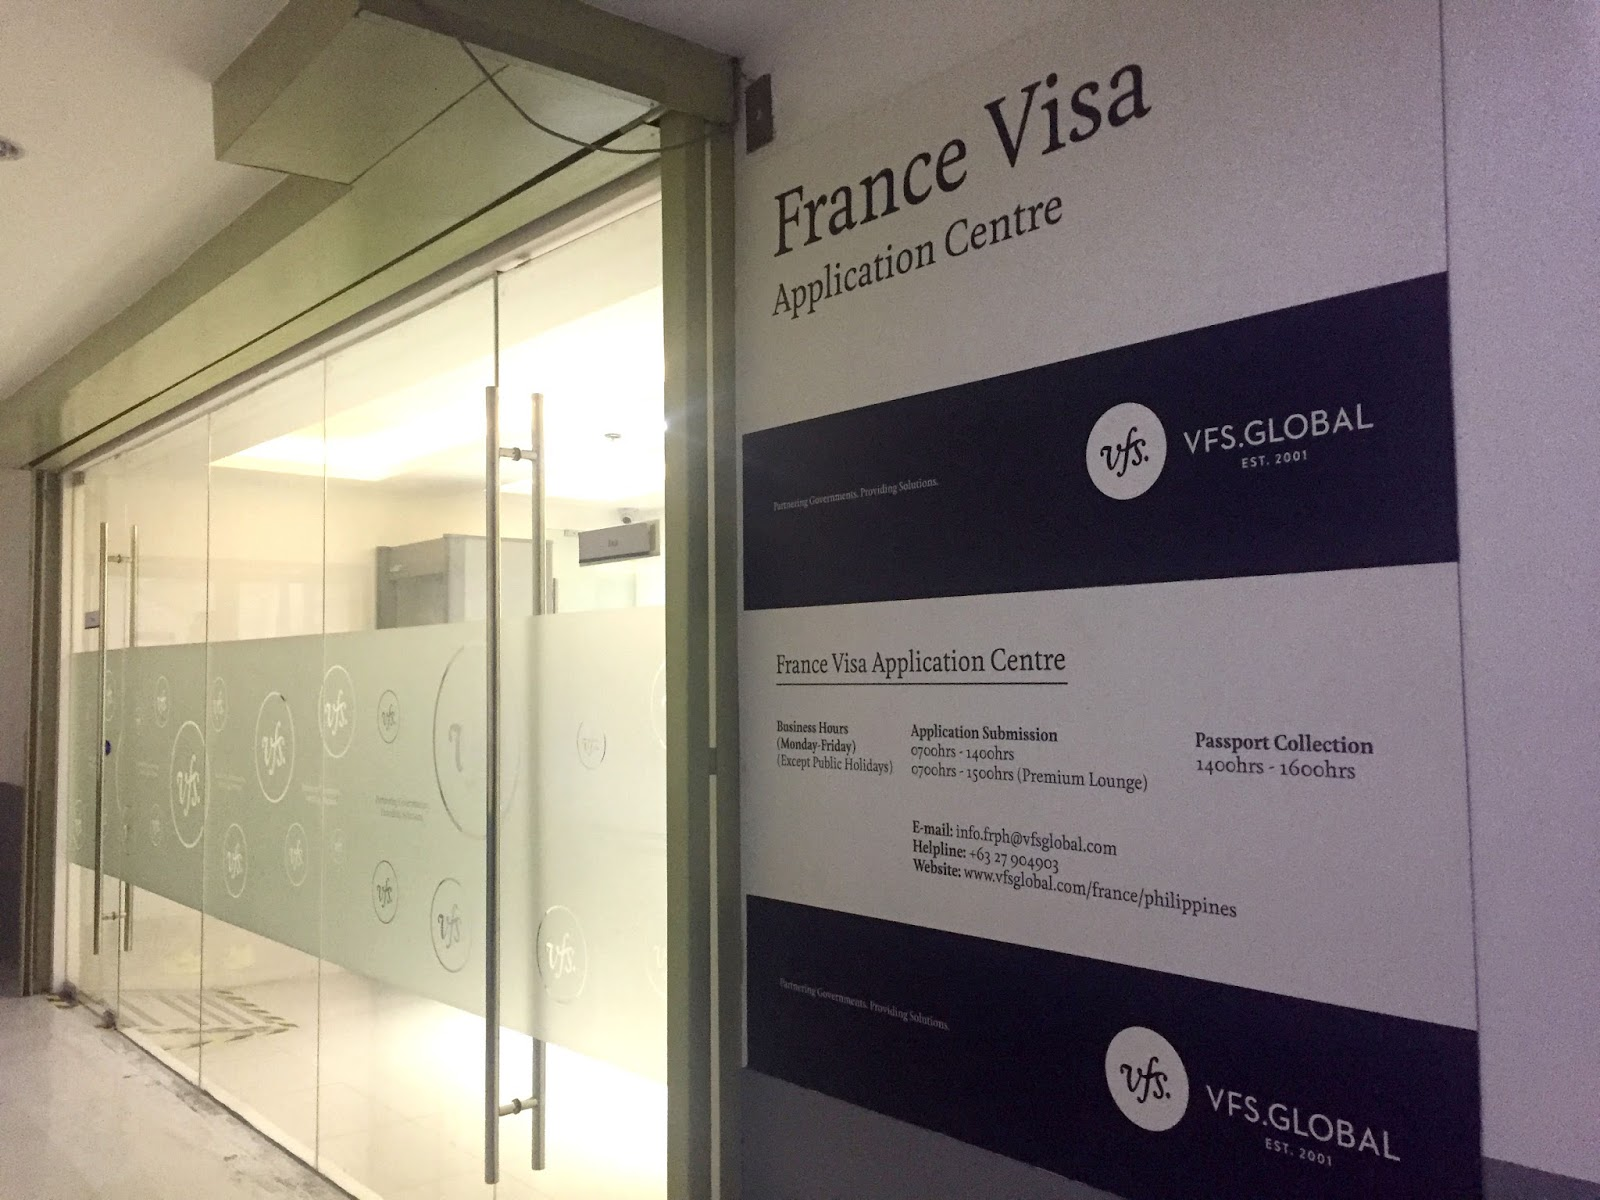 philippine embassy visa application form